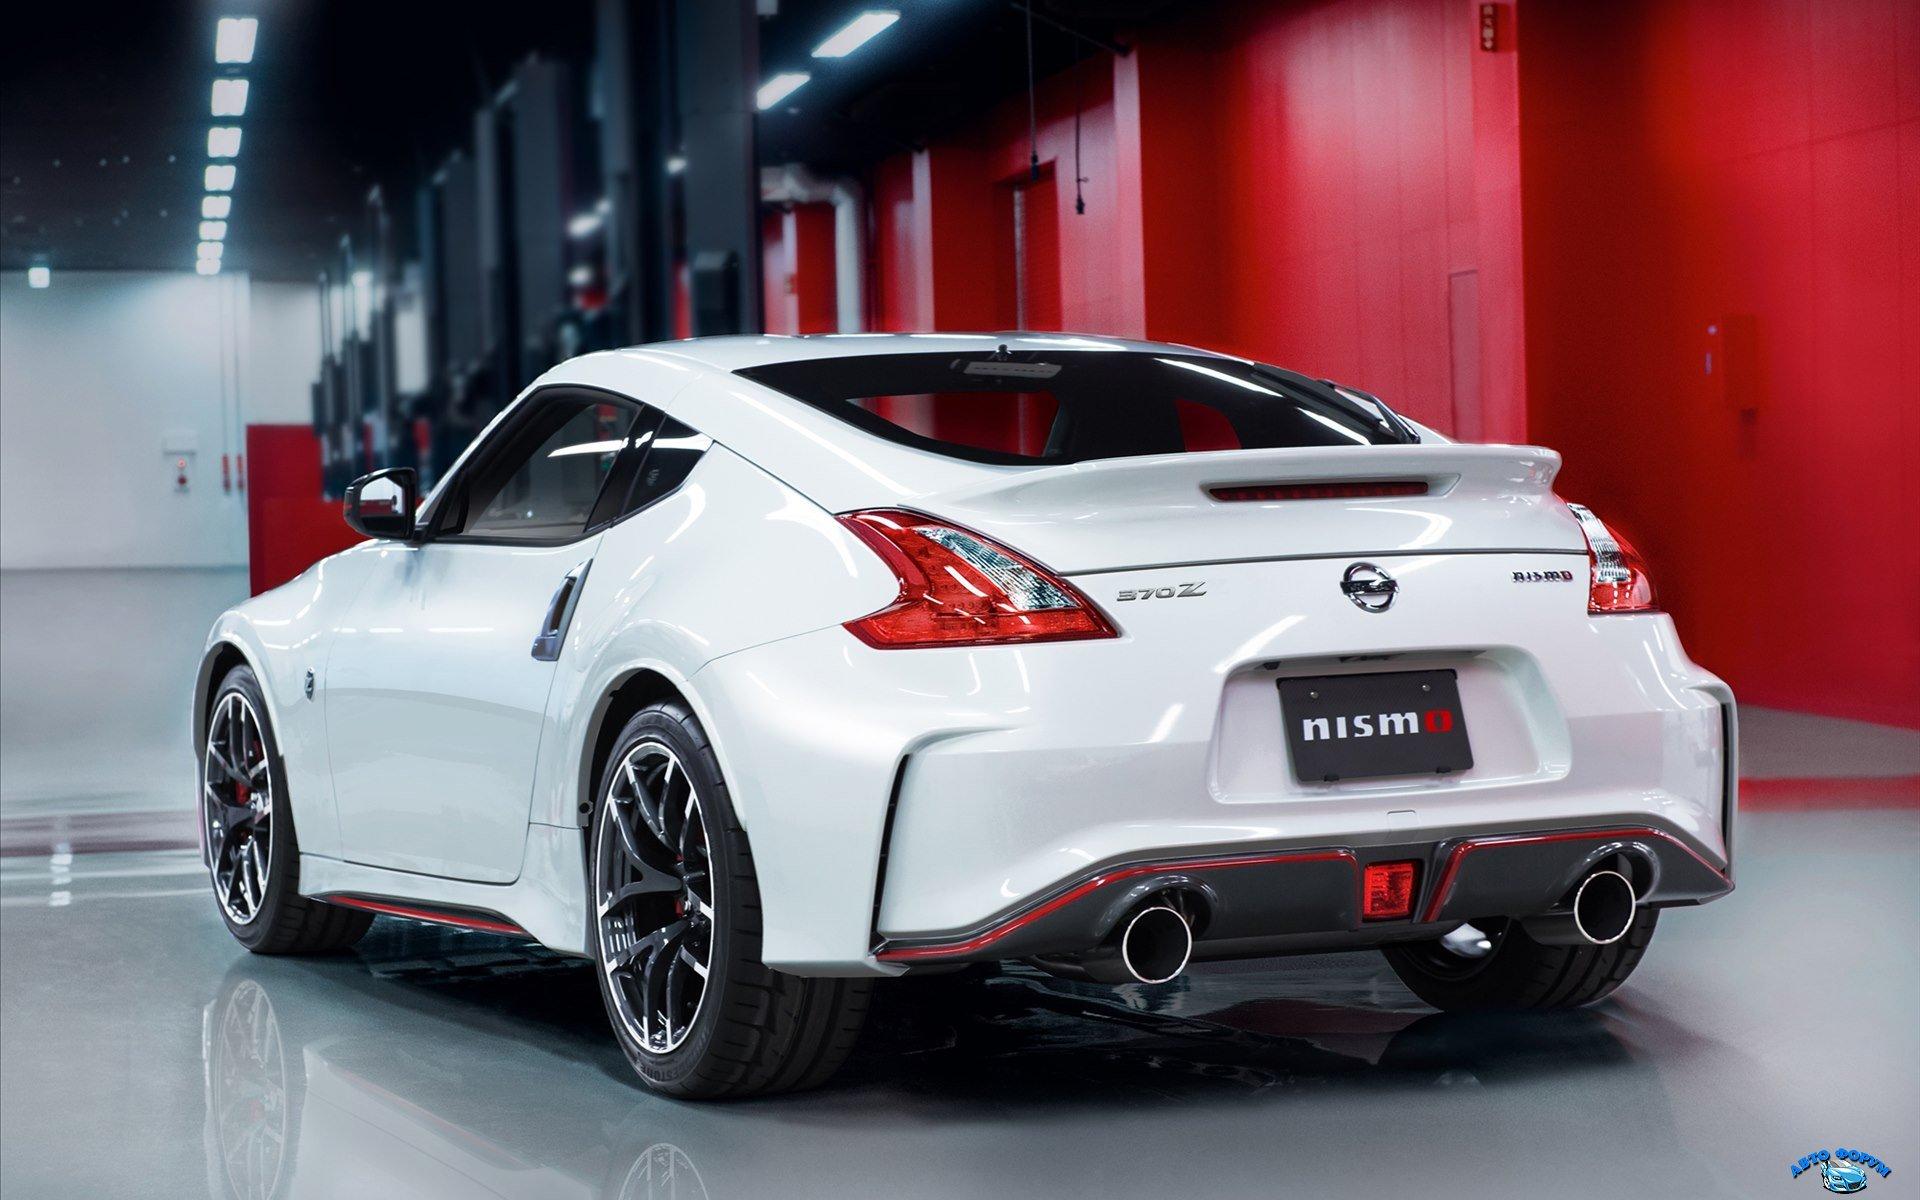 Nissan-370Z-Nismo-2015-widescreen-03.jpg